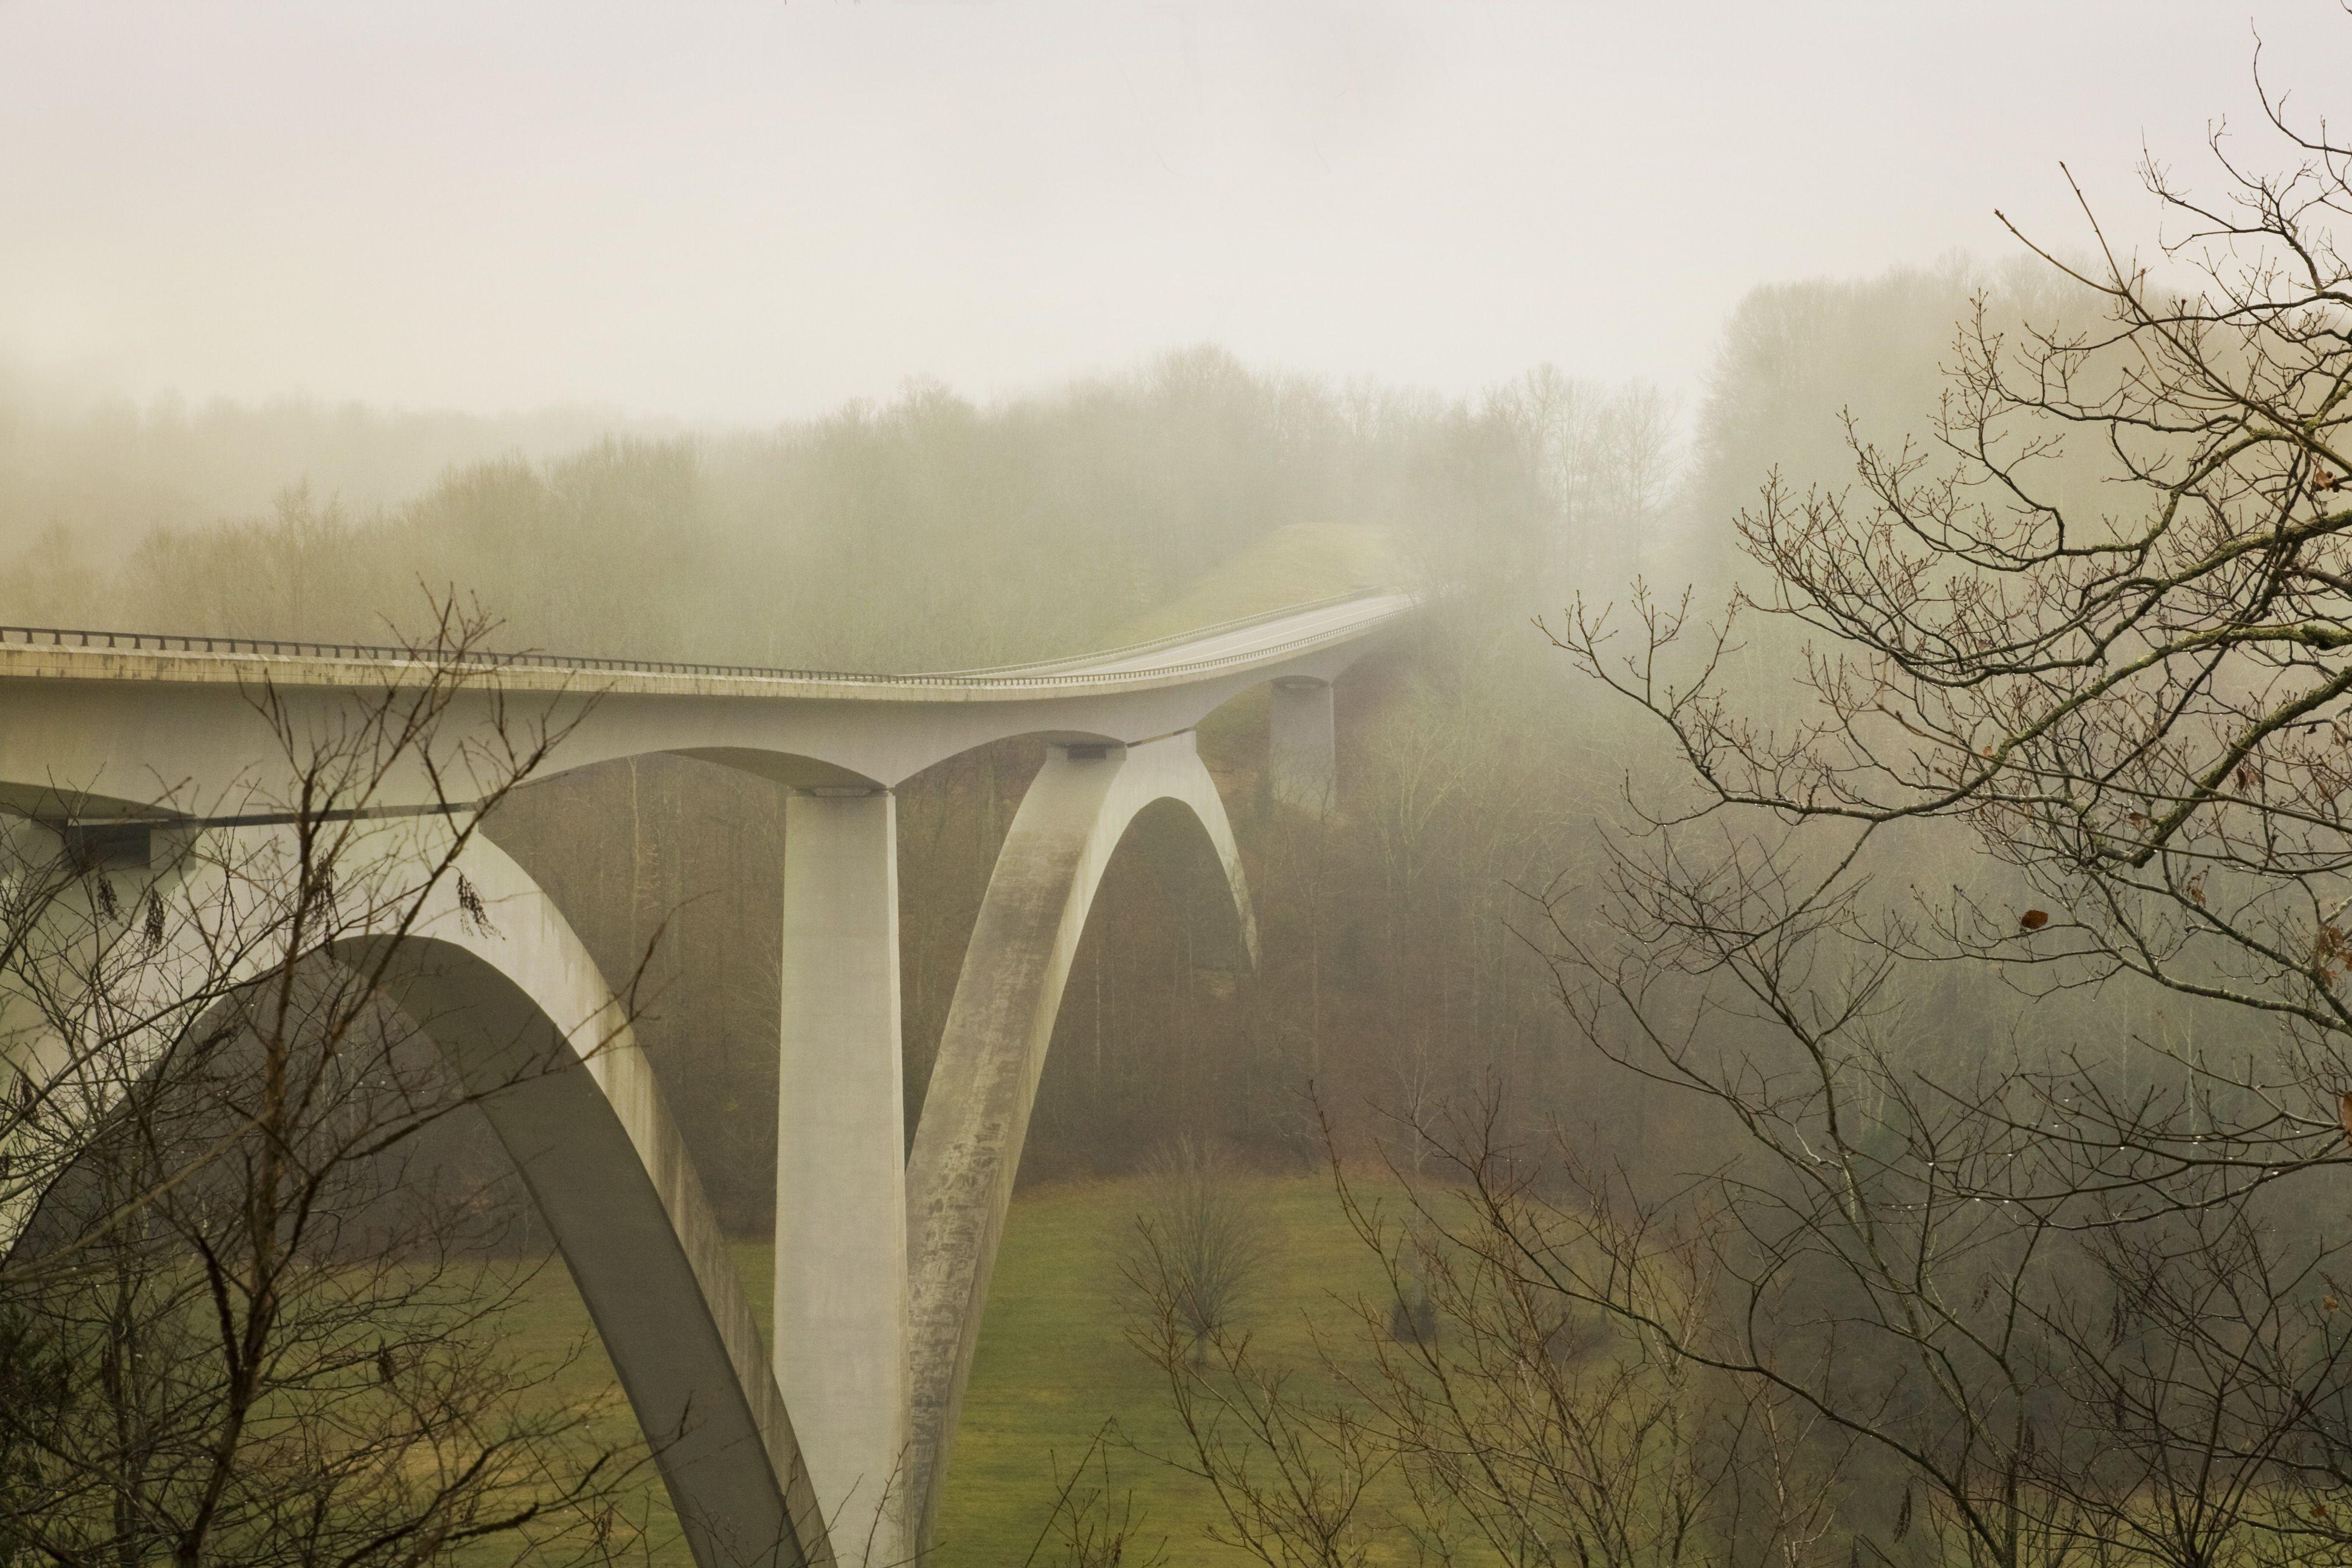 Natchez Trace Bridge over Hwy 96 in Franklin, TN